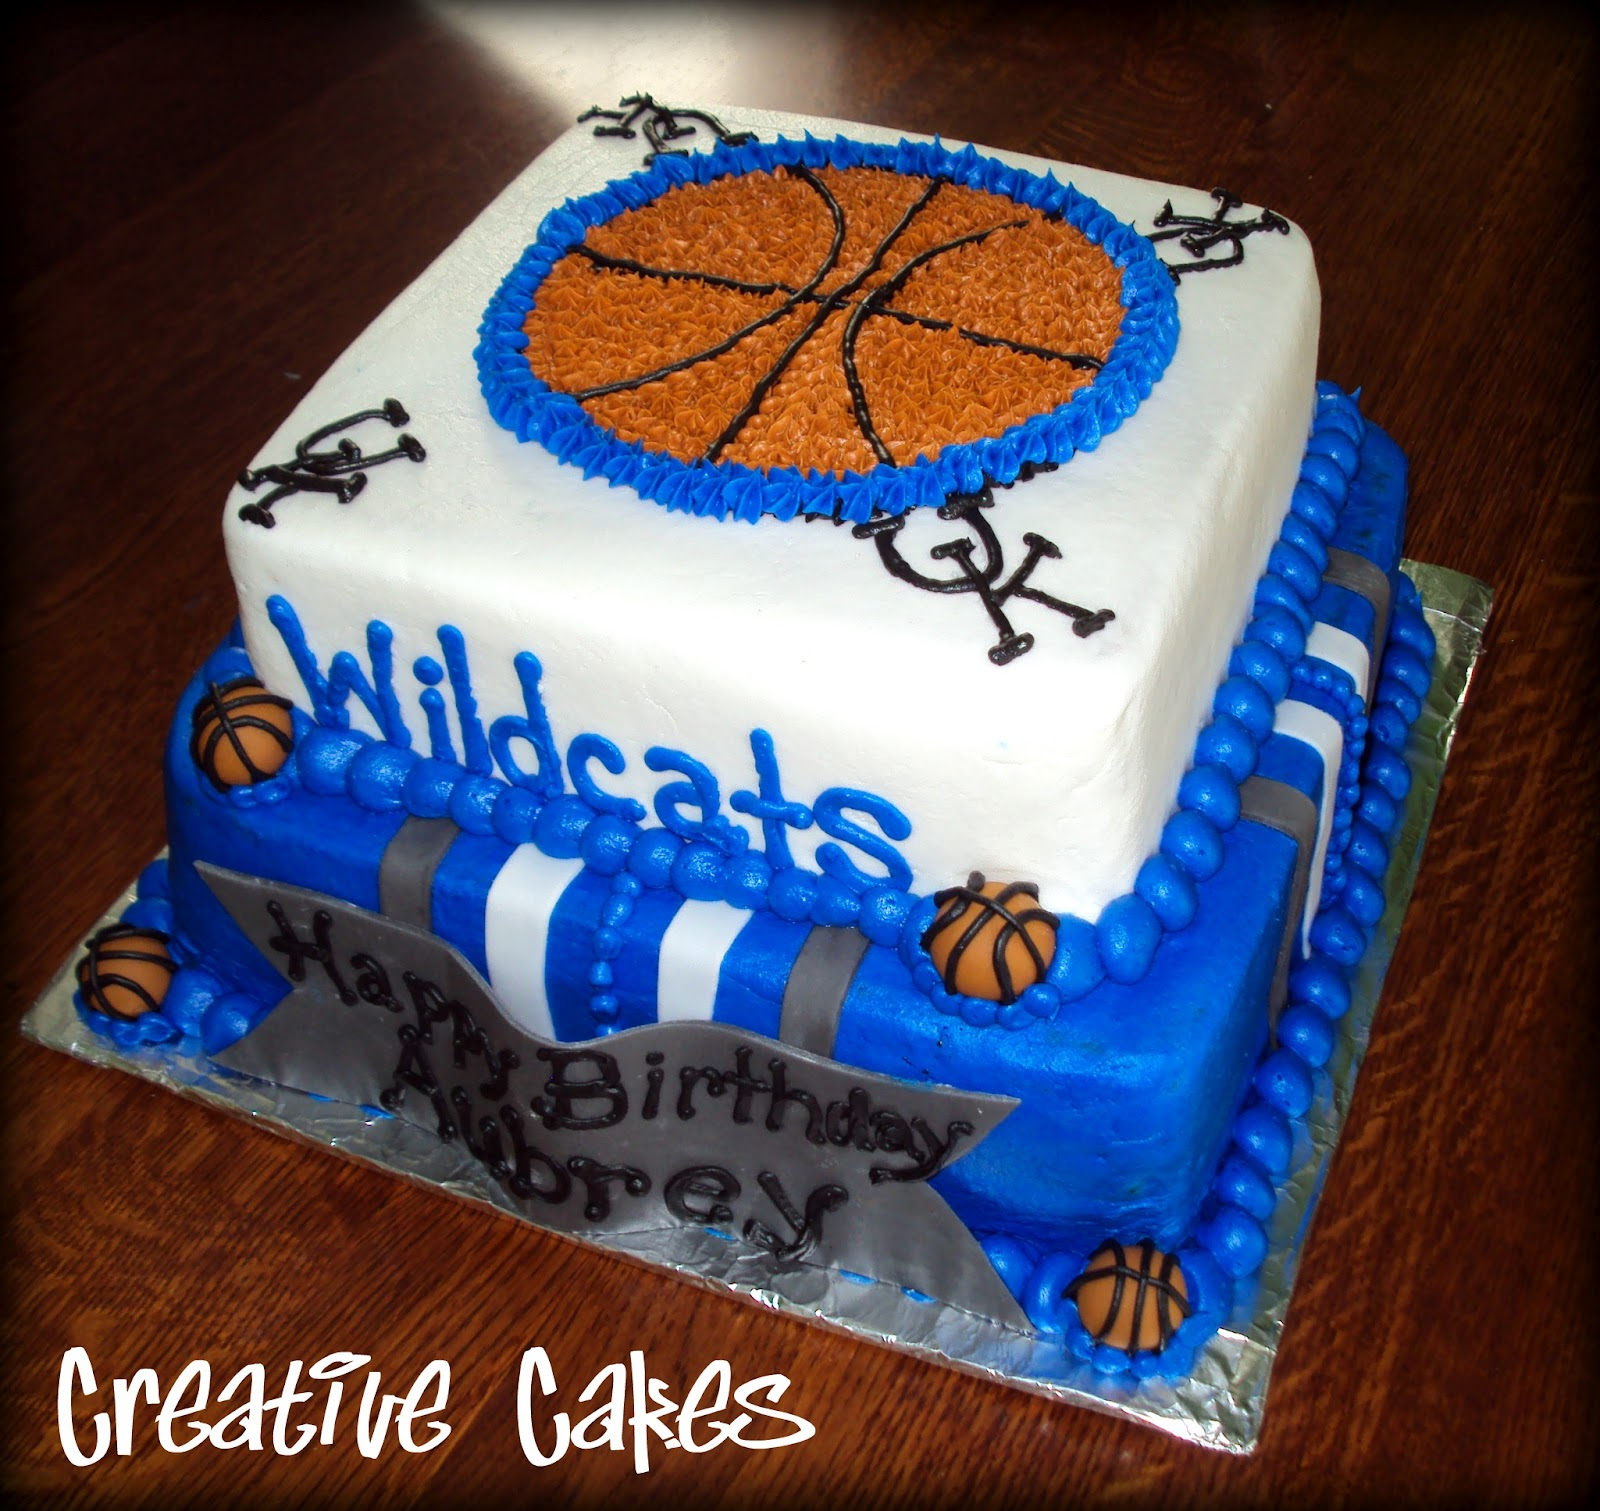 Creative Cakes: February 2012